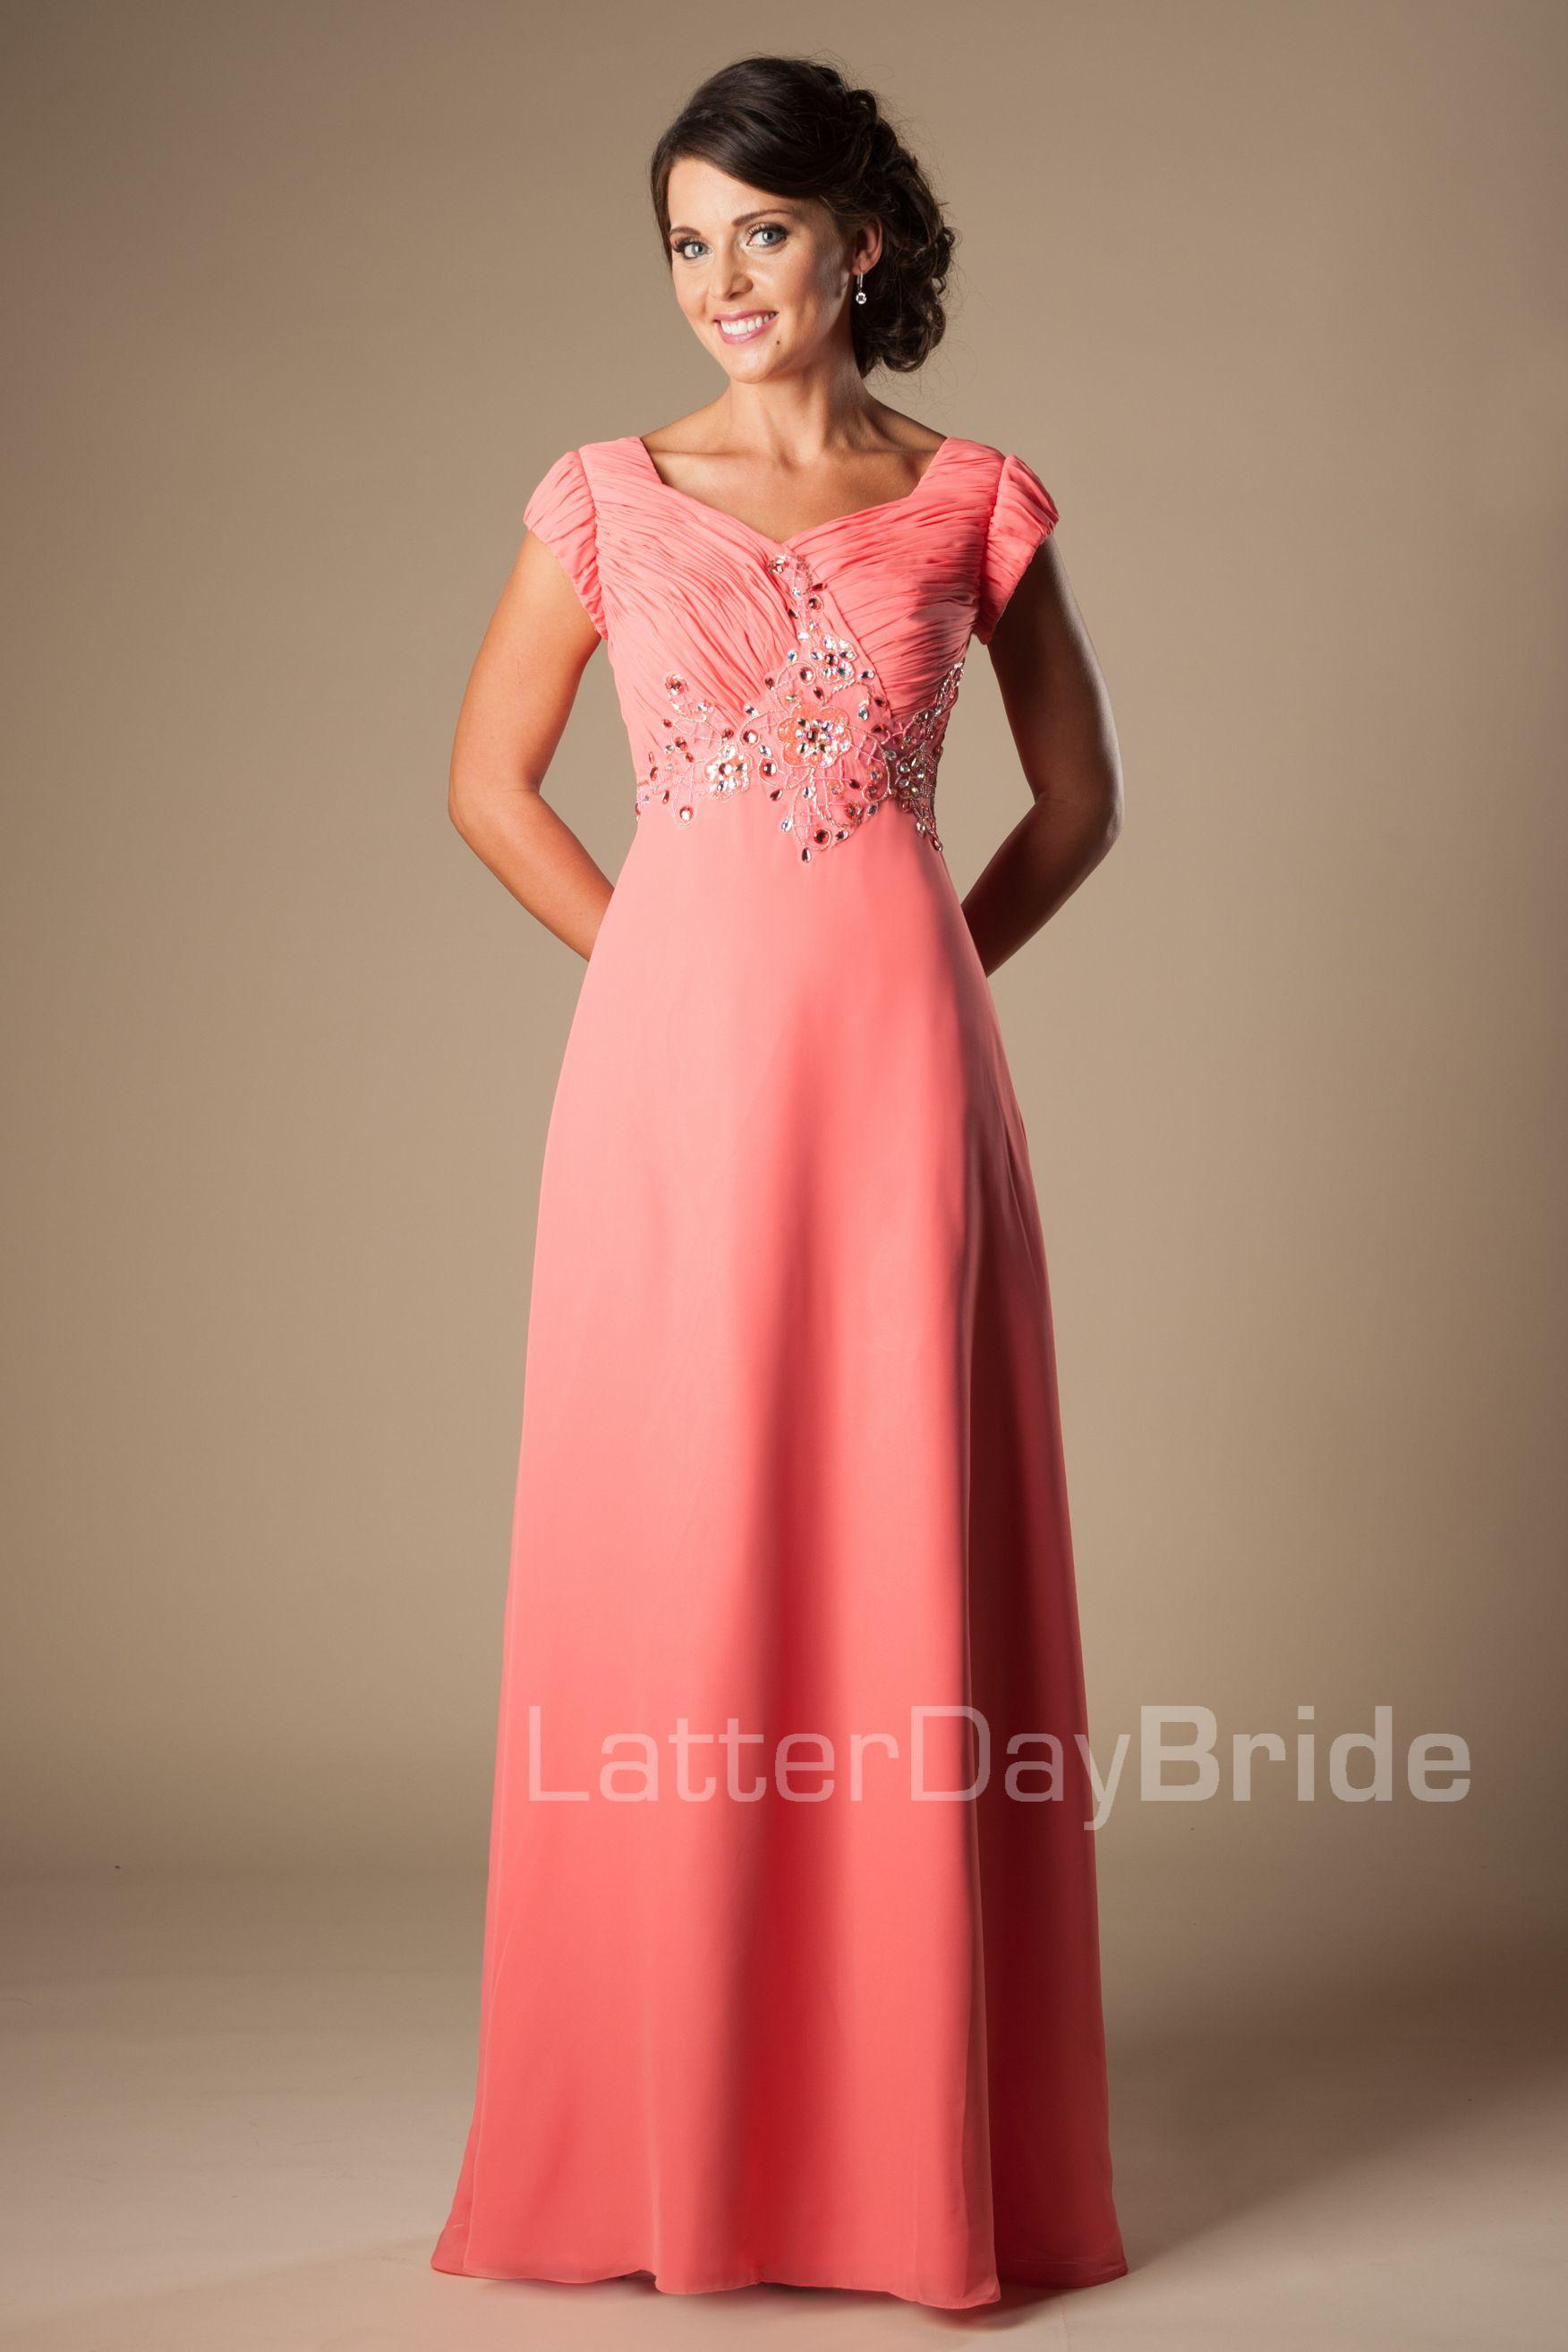 Beaded Chiffon Prom Dress